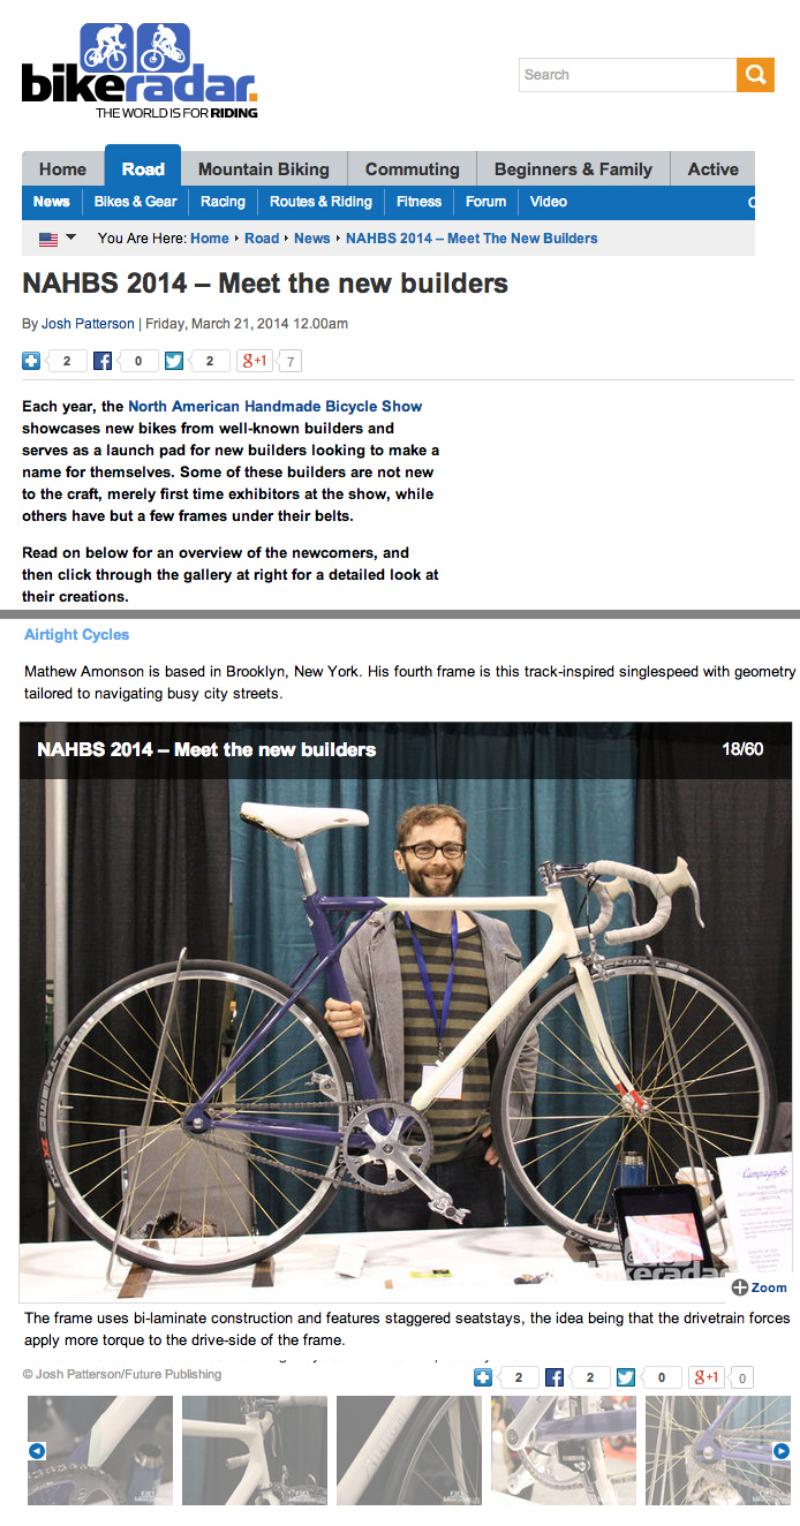 bikeradar_airtightcycles